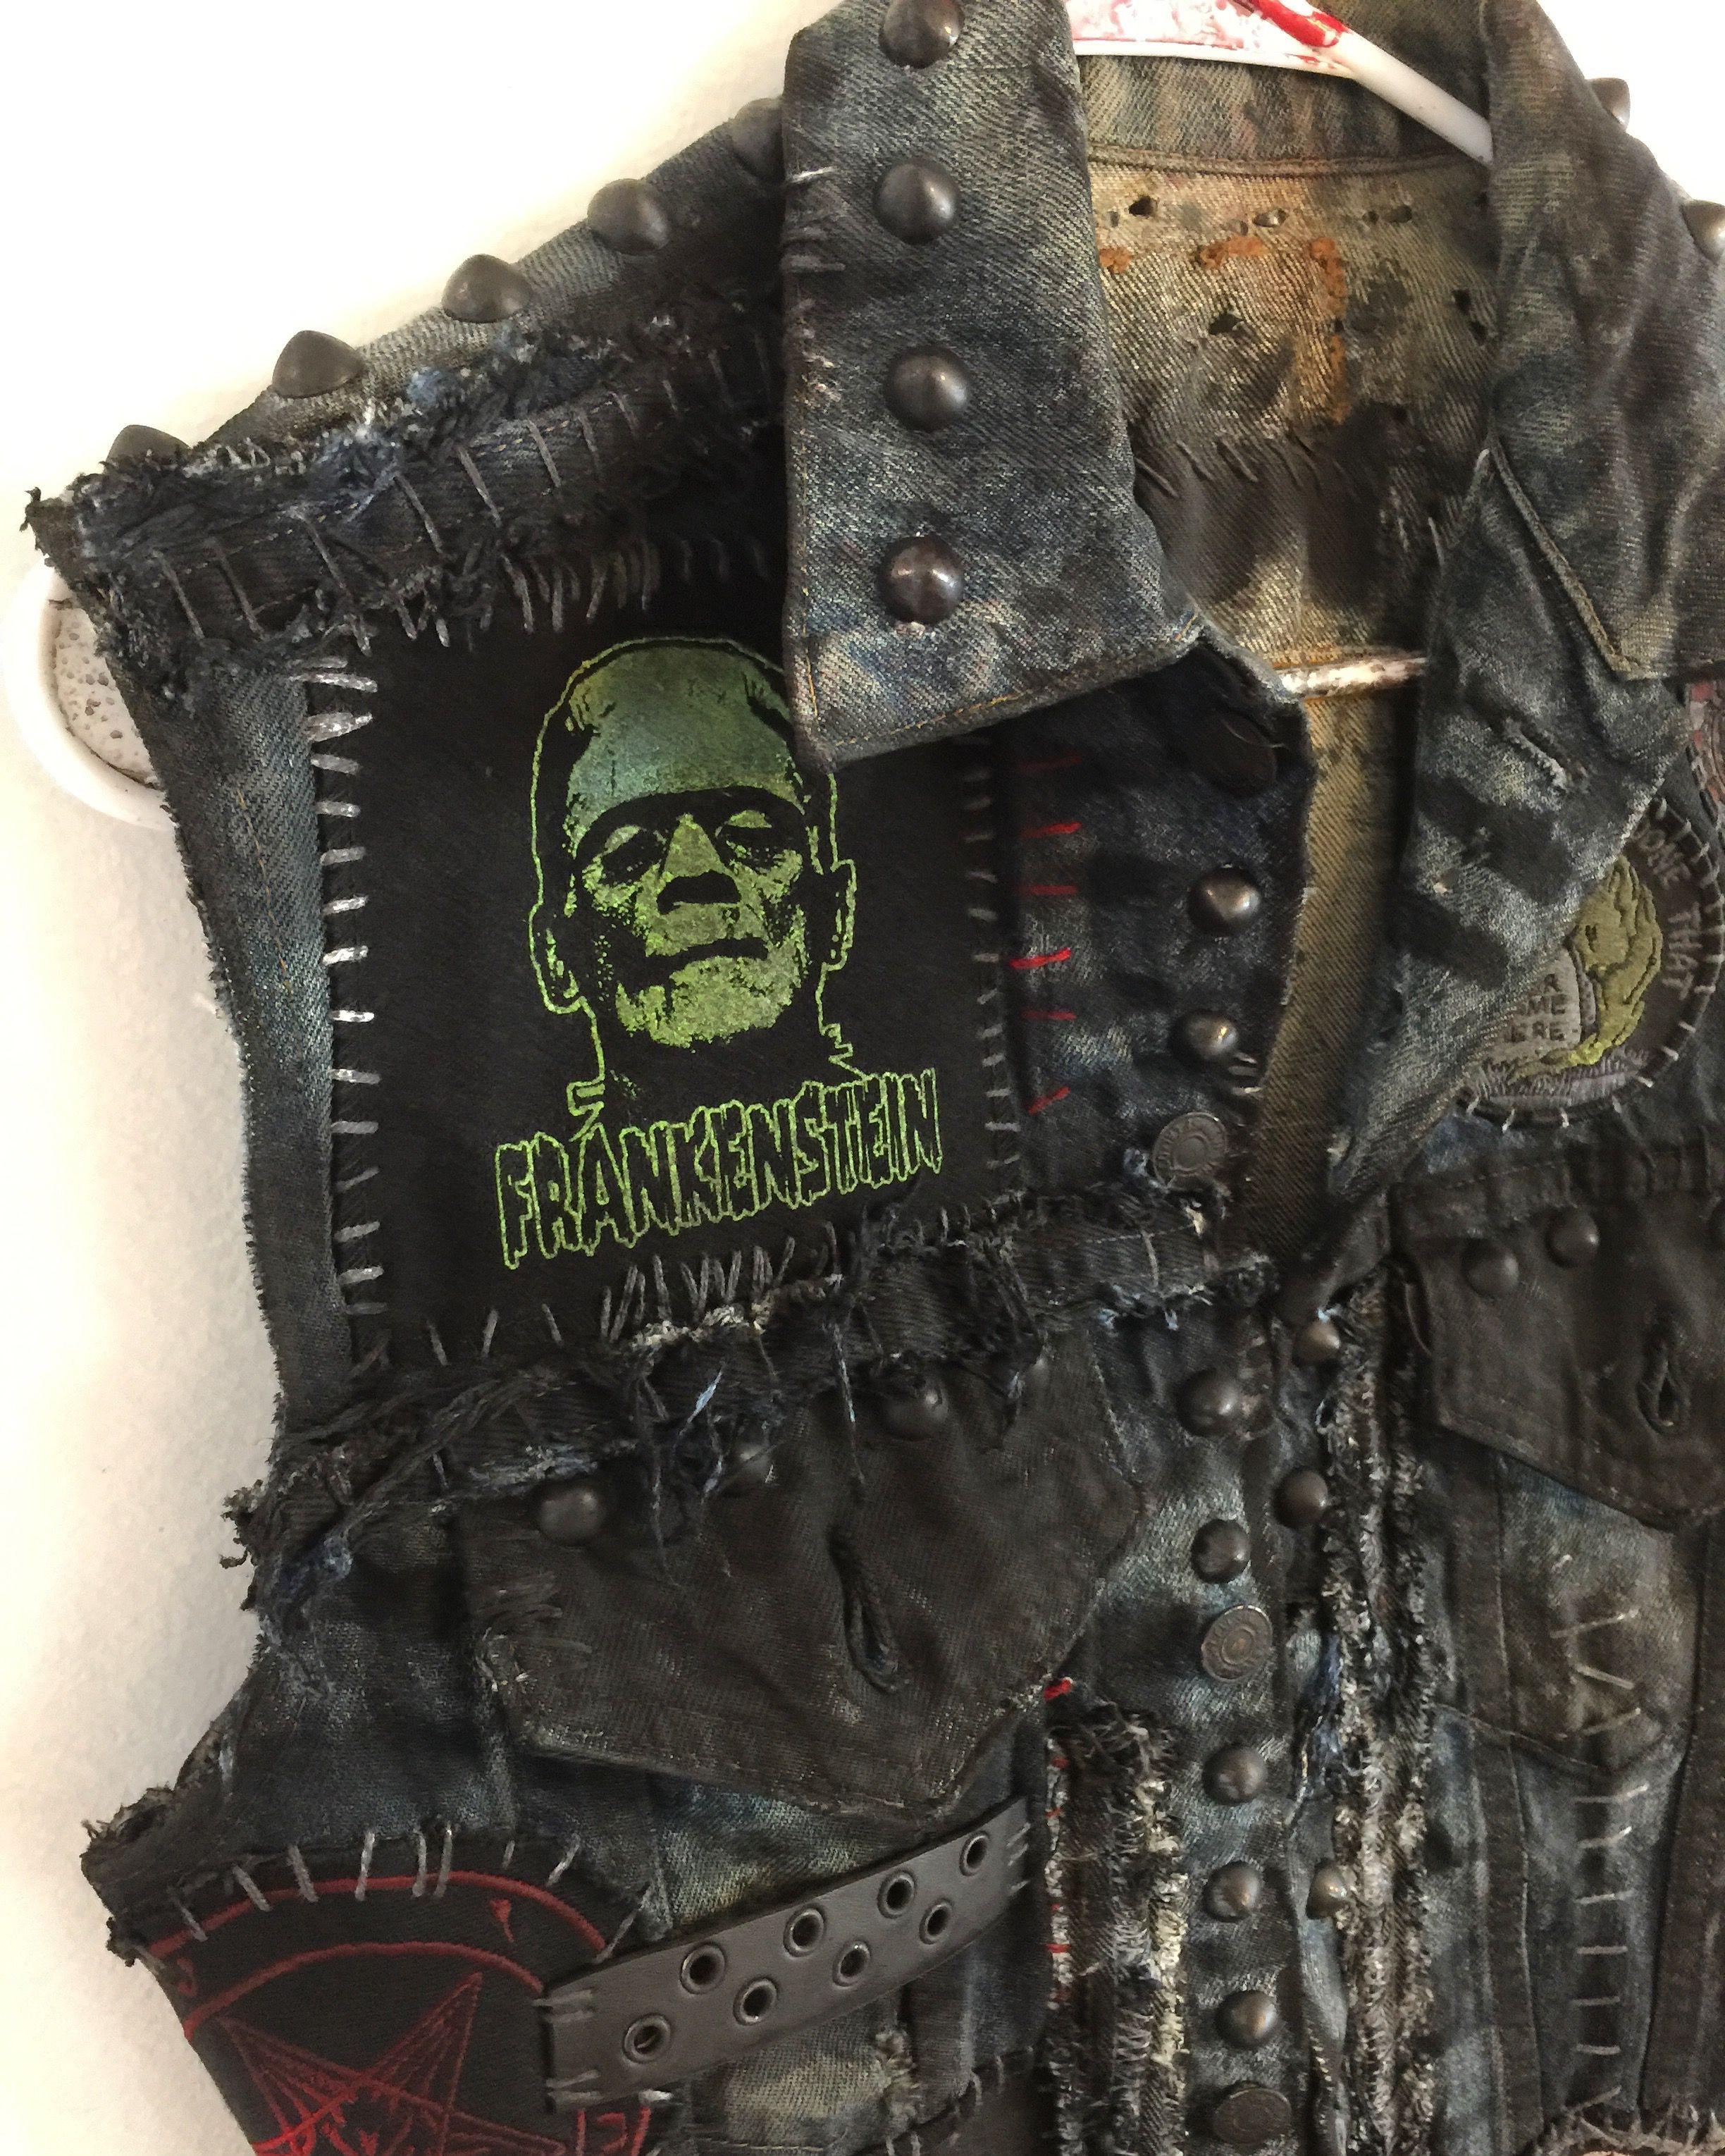 bdddb5356ccee Distressed denim vest from Chad Cherry Clothing. Horror vest. Frankenstein  vest. Studded vest. Classic horror vest.